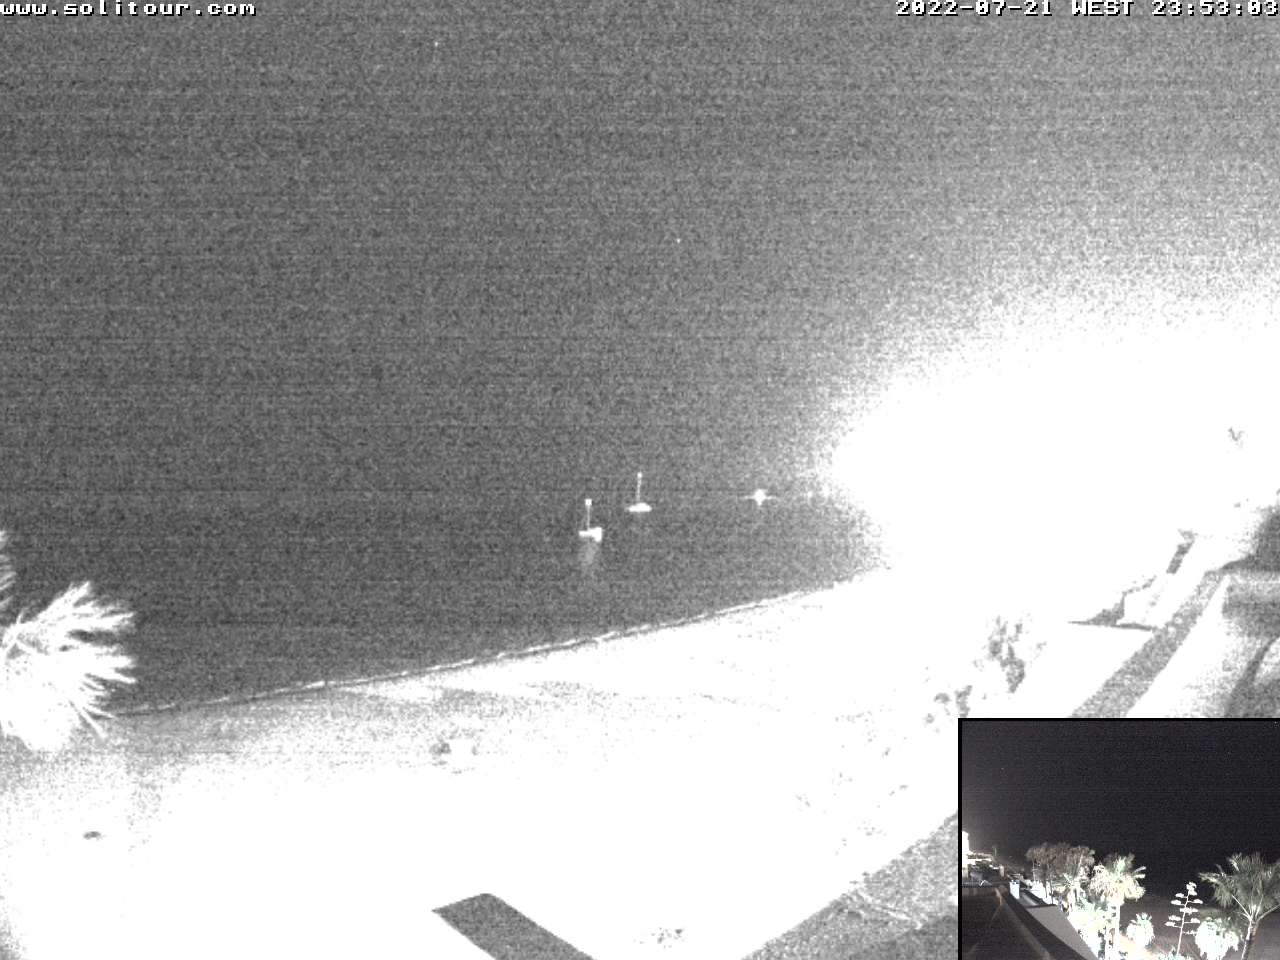 Jandia (Fuerteventura) Fri. 23:53